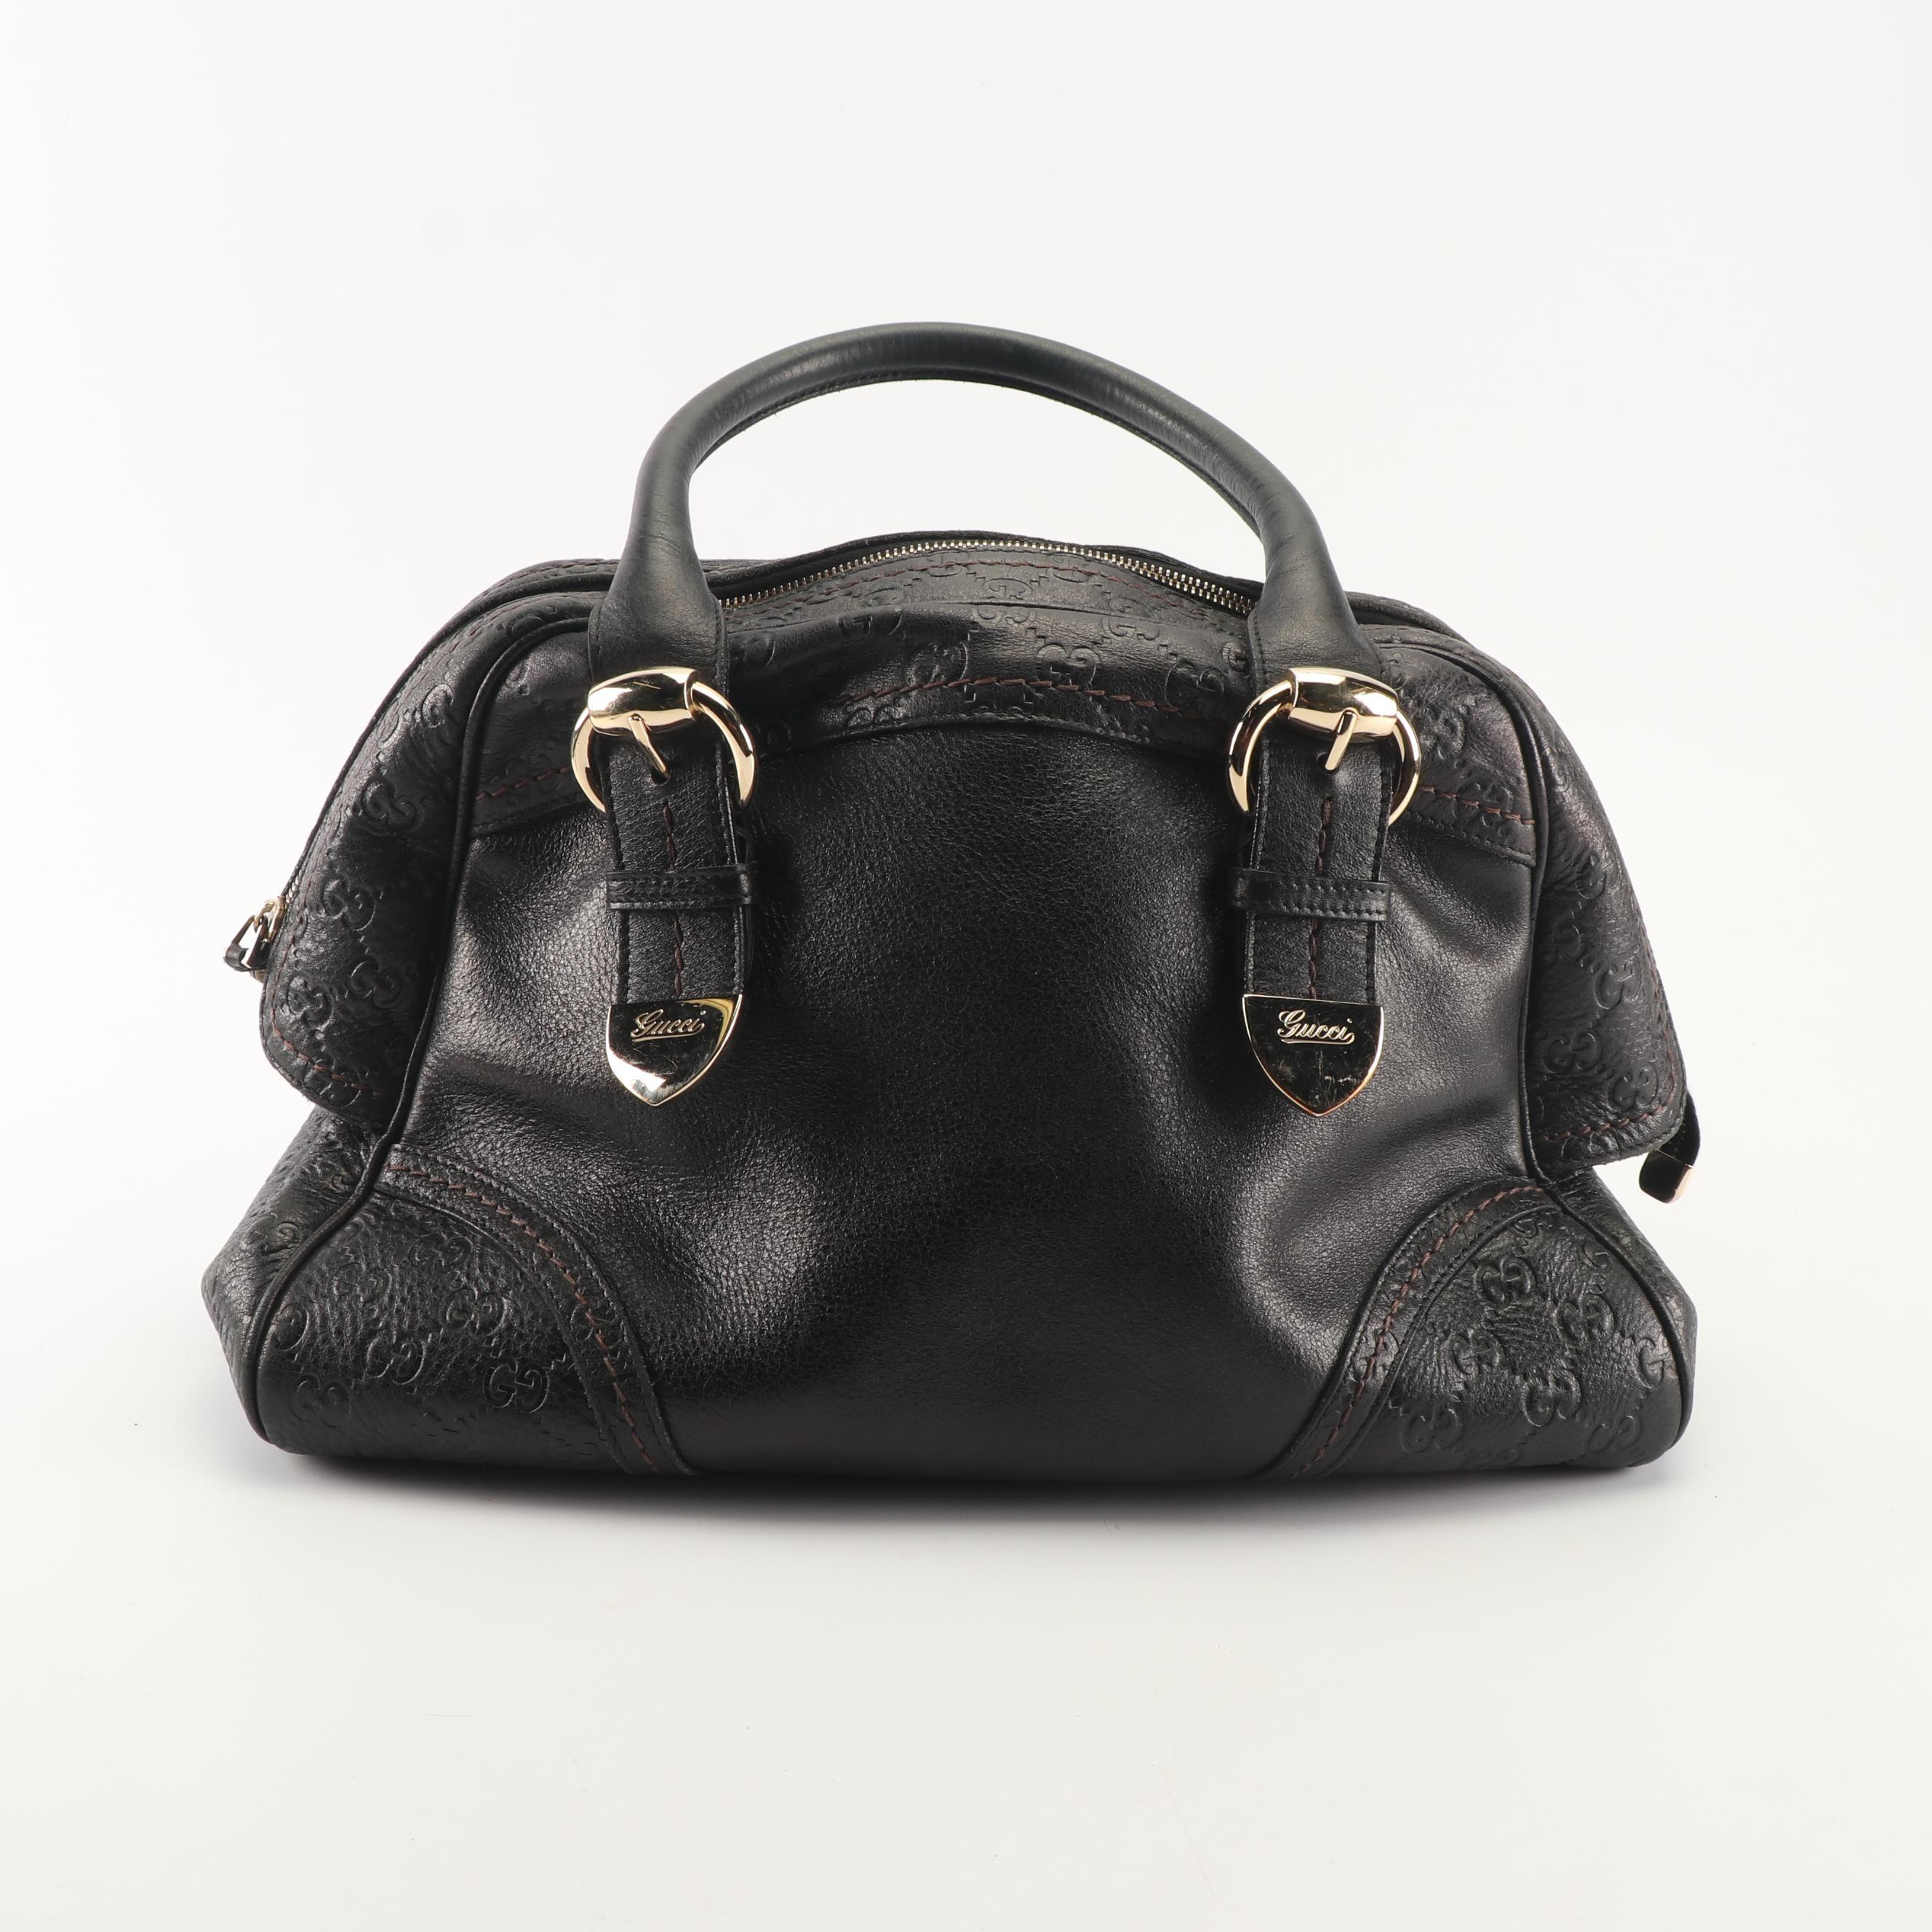 Vintage Gucci Black Guccissima Leather Handbag